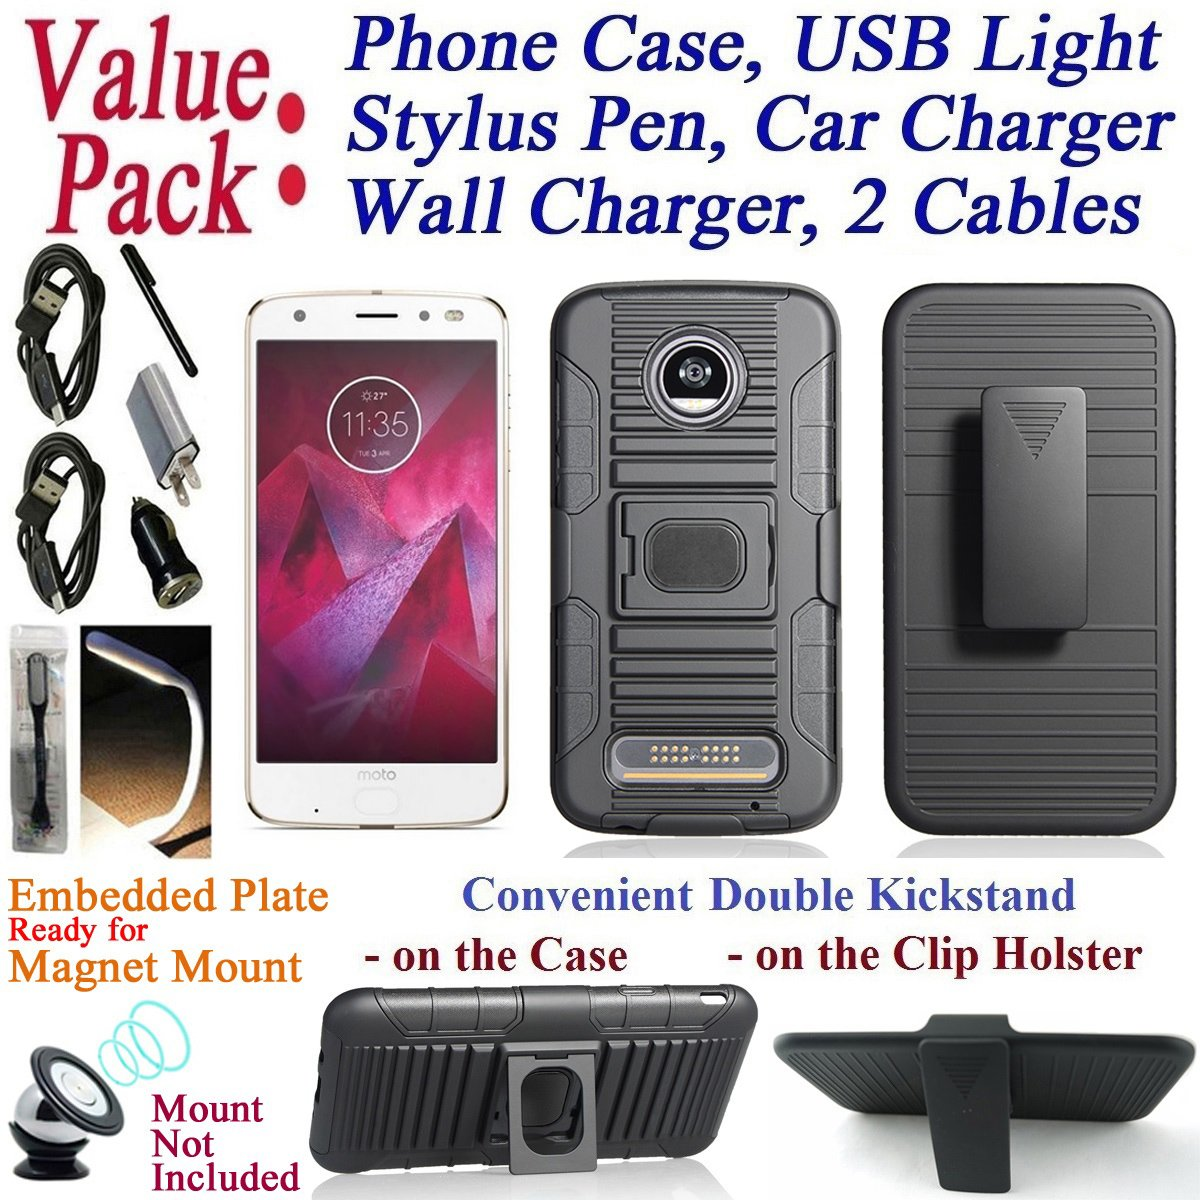 Value Pack + for 5.5'' Motorola moto Z2 Play Z2 Force Case Phone Case Belt Holster 2 KickStand Magnet Mount Ready Hybrid Armor Shock Bumper Cover (Black)